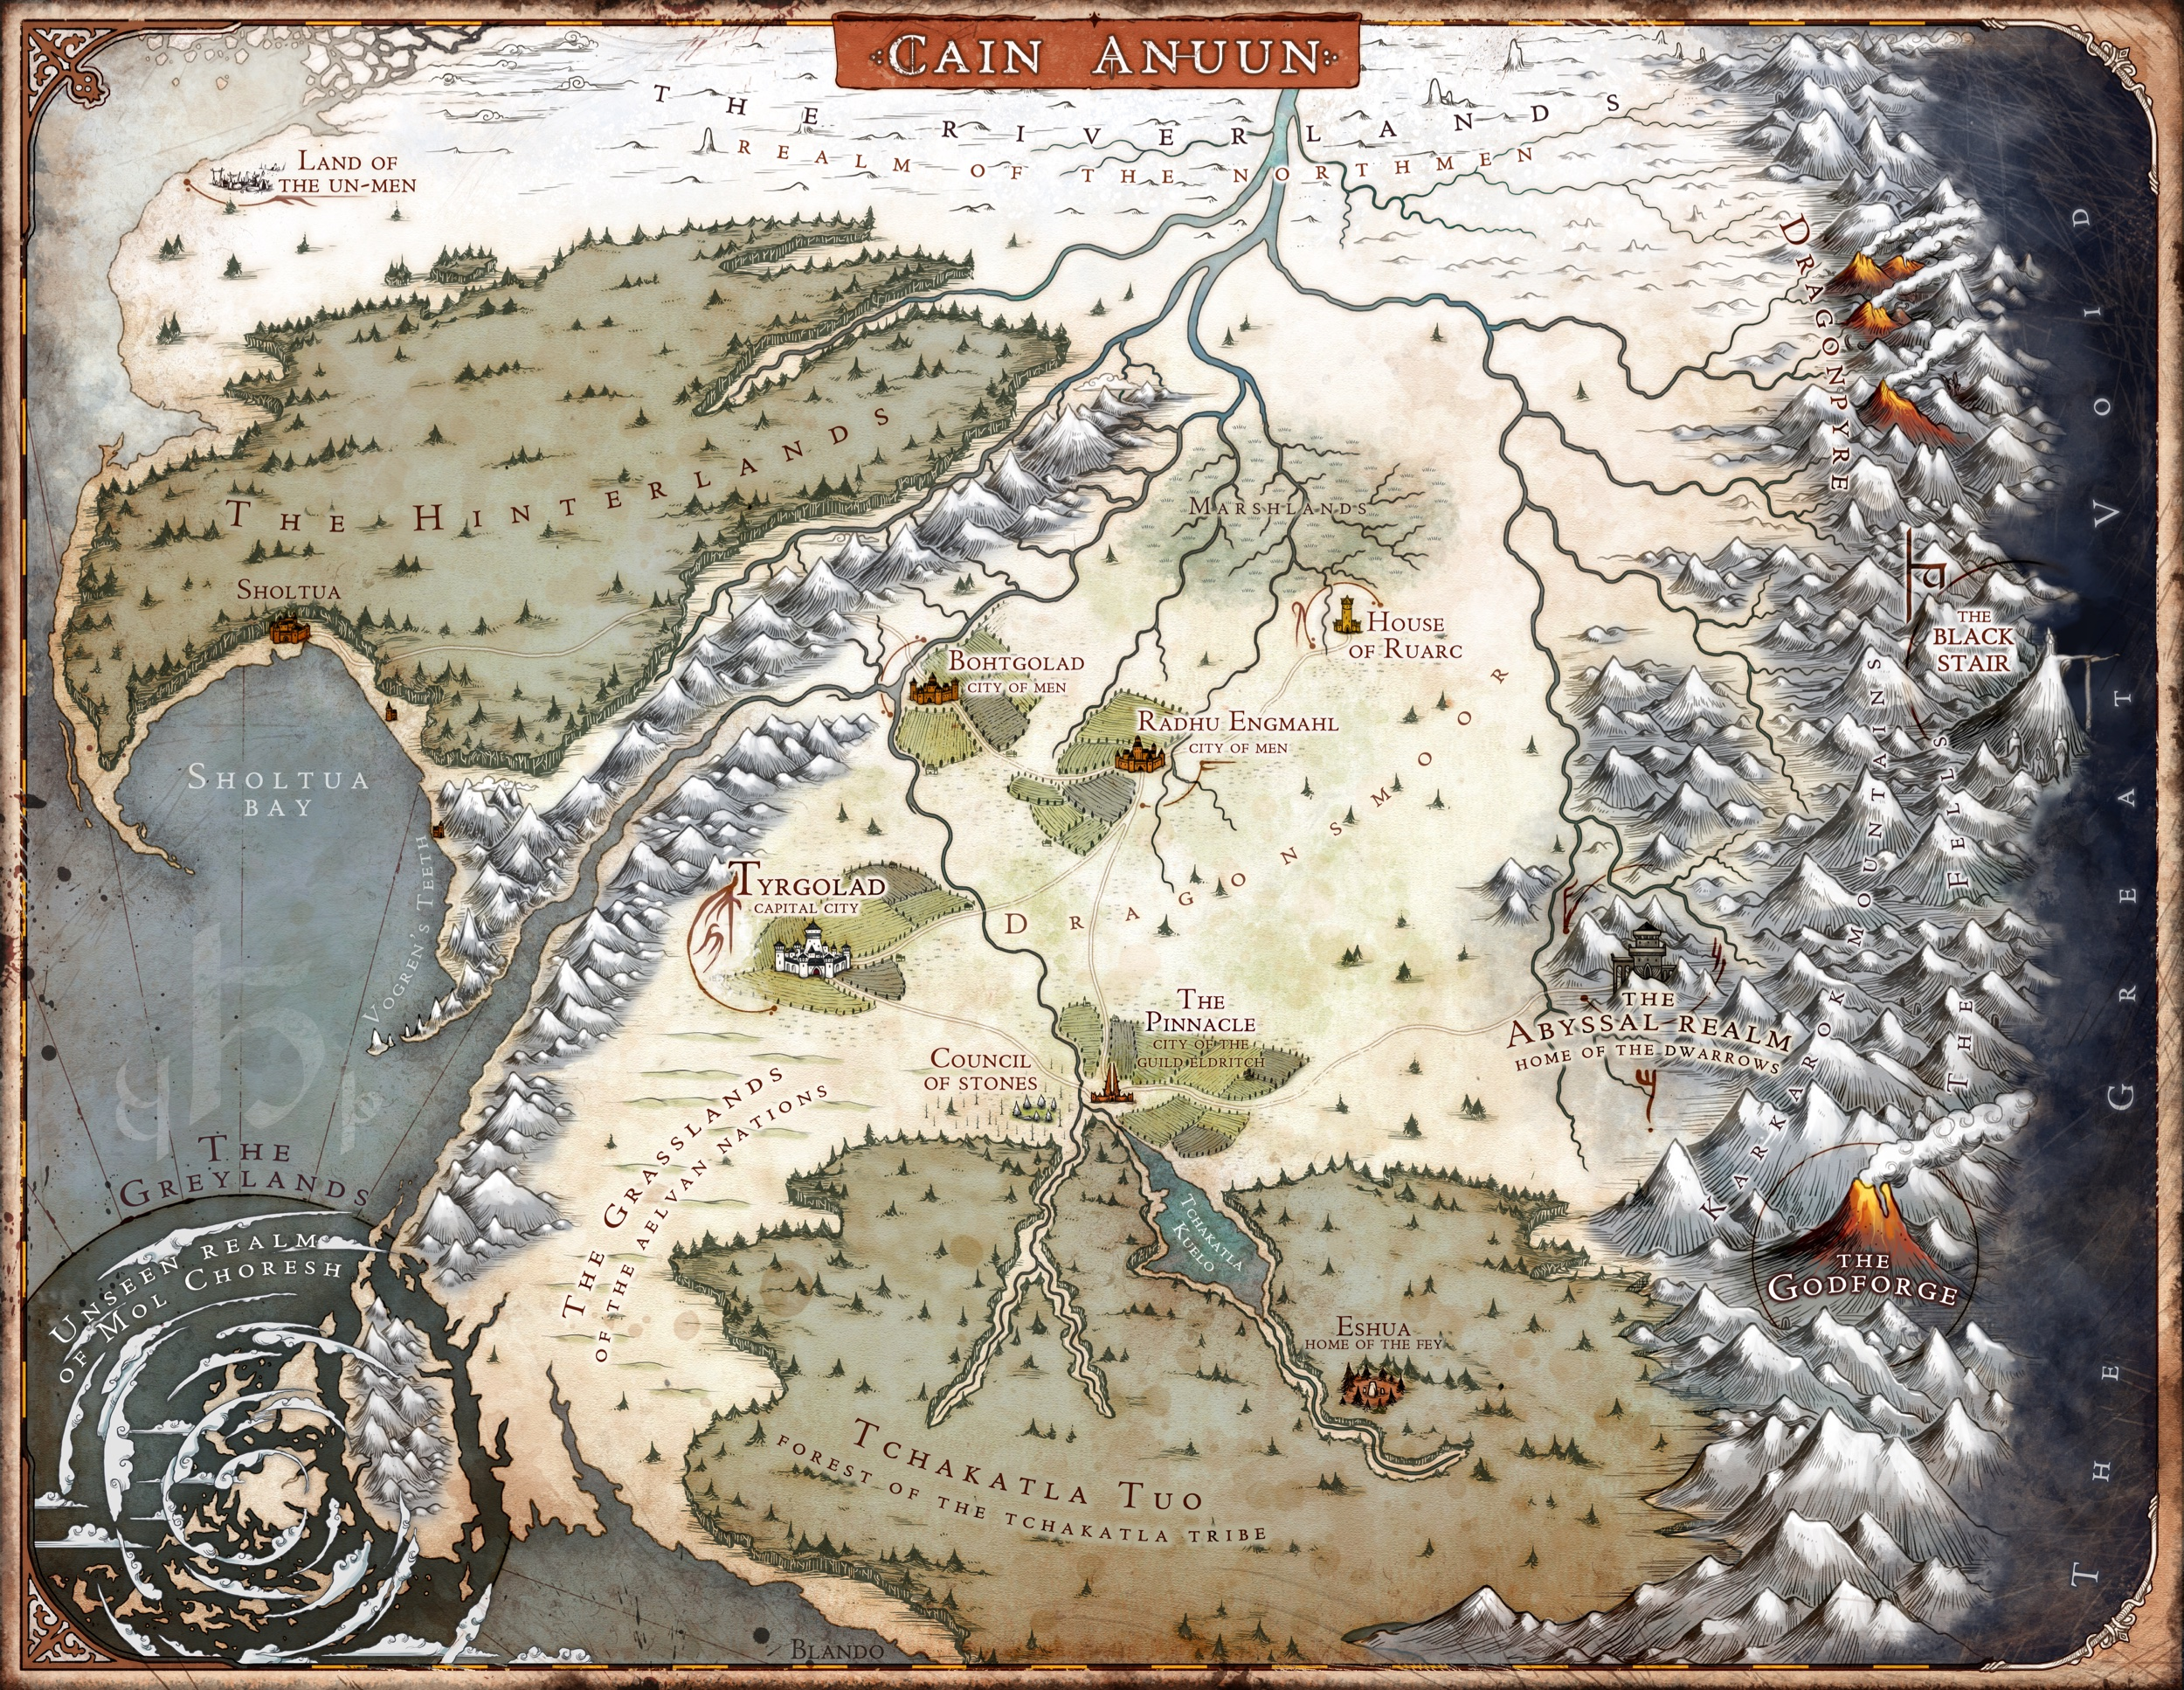 The-Last-God-World-map-Blando-Final-T-Revised.jpeg